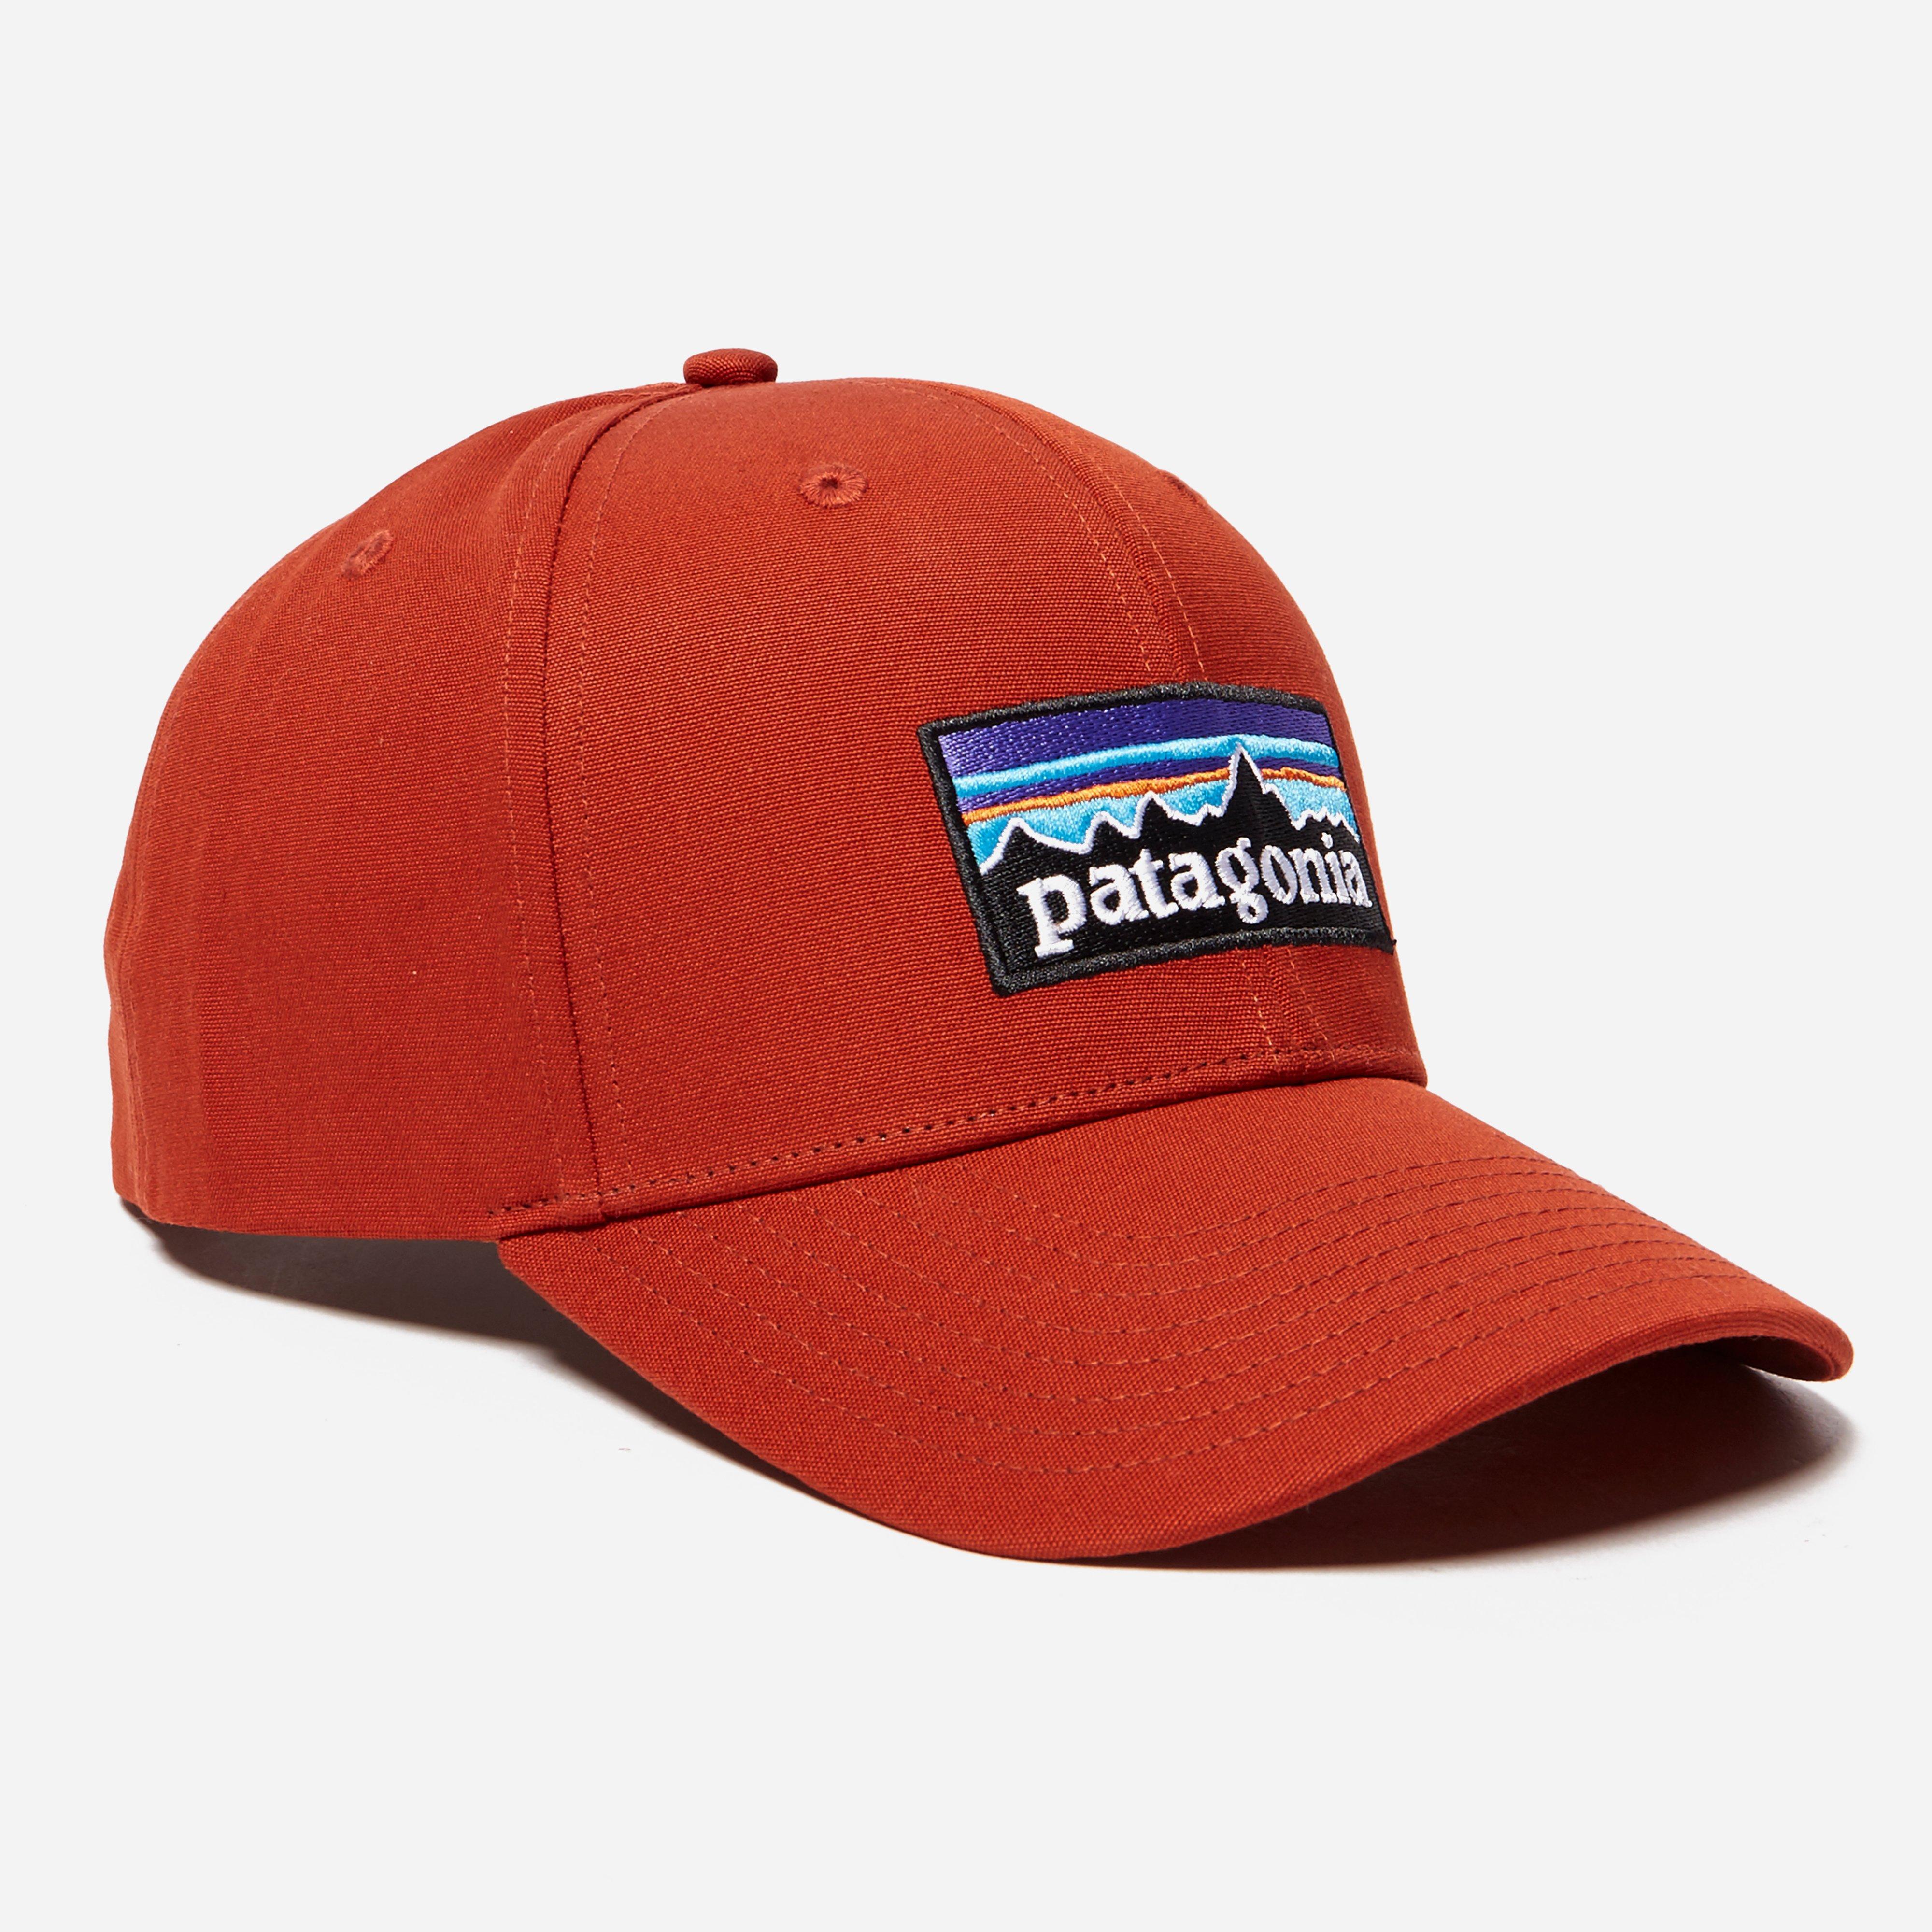 Lyst - Patagonia P-6 Logo Roger That Hat in Red for Men 1c514ec1dac